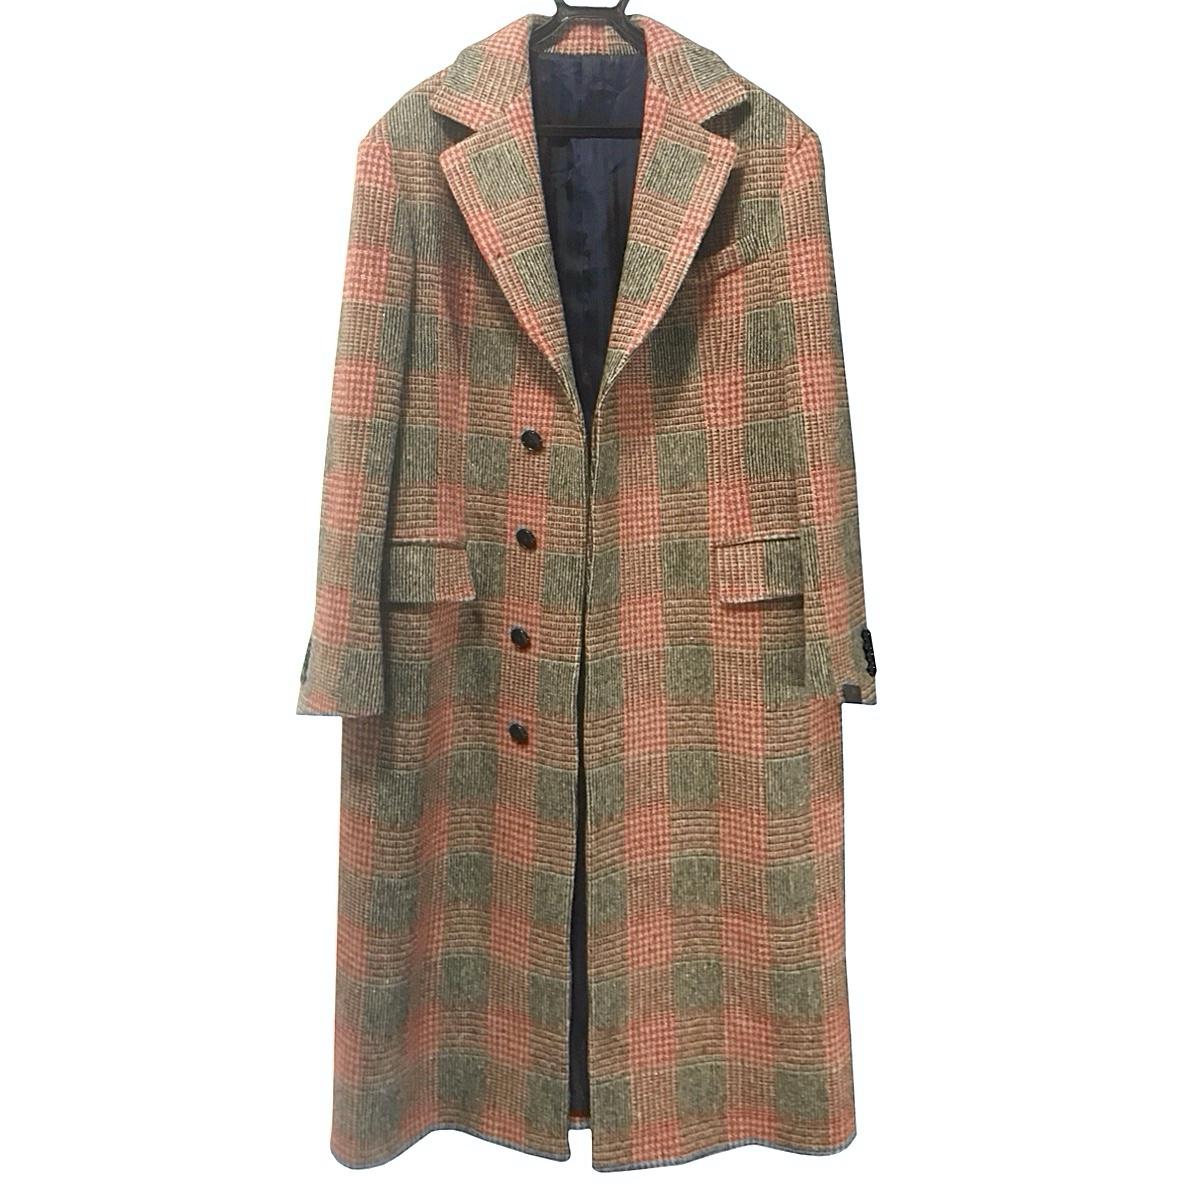 MP Massimo Piombo Red PrinceofWales Check Wool Coat.jpg